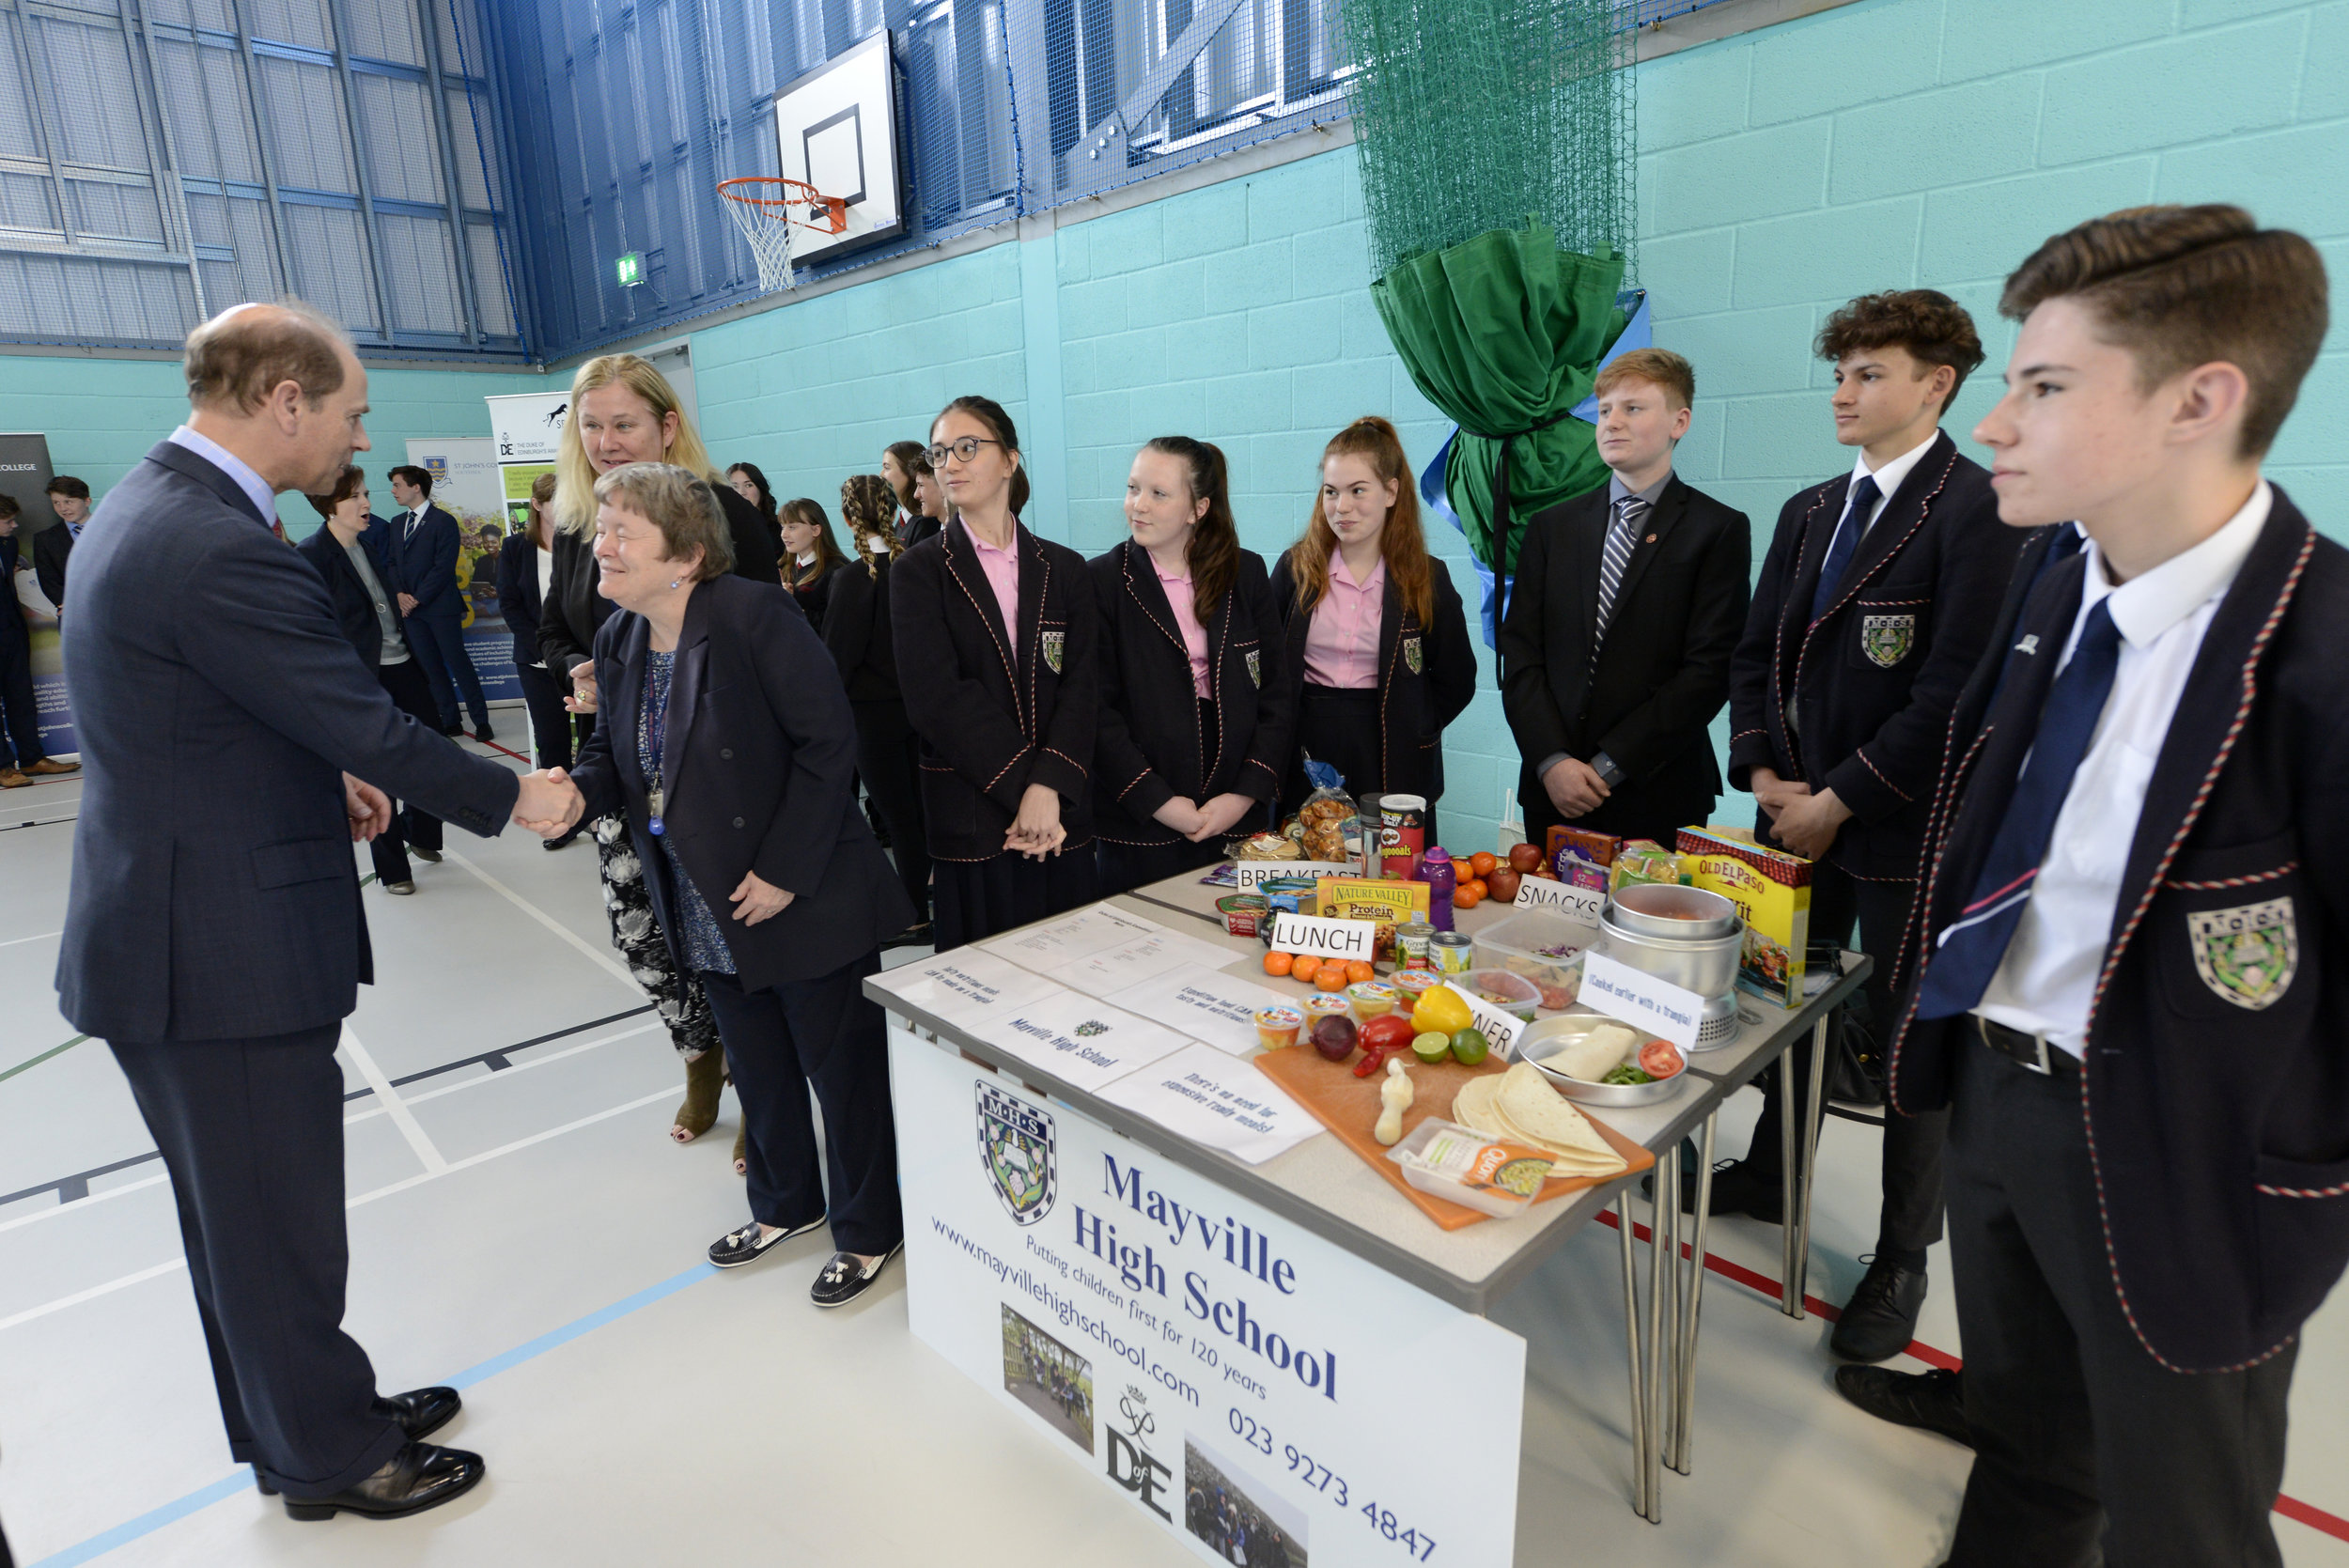 Mayville High School Duke of Edinburgh Award Scheme